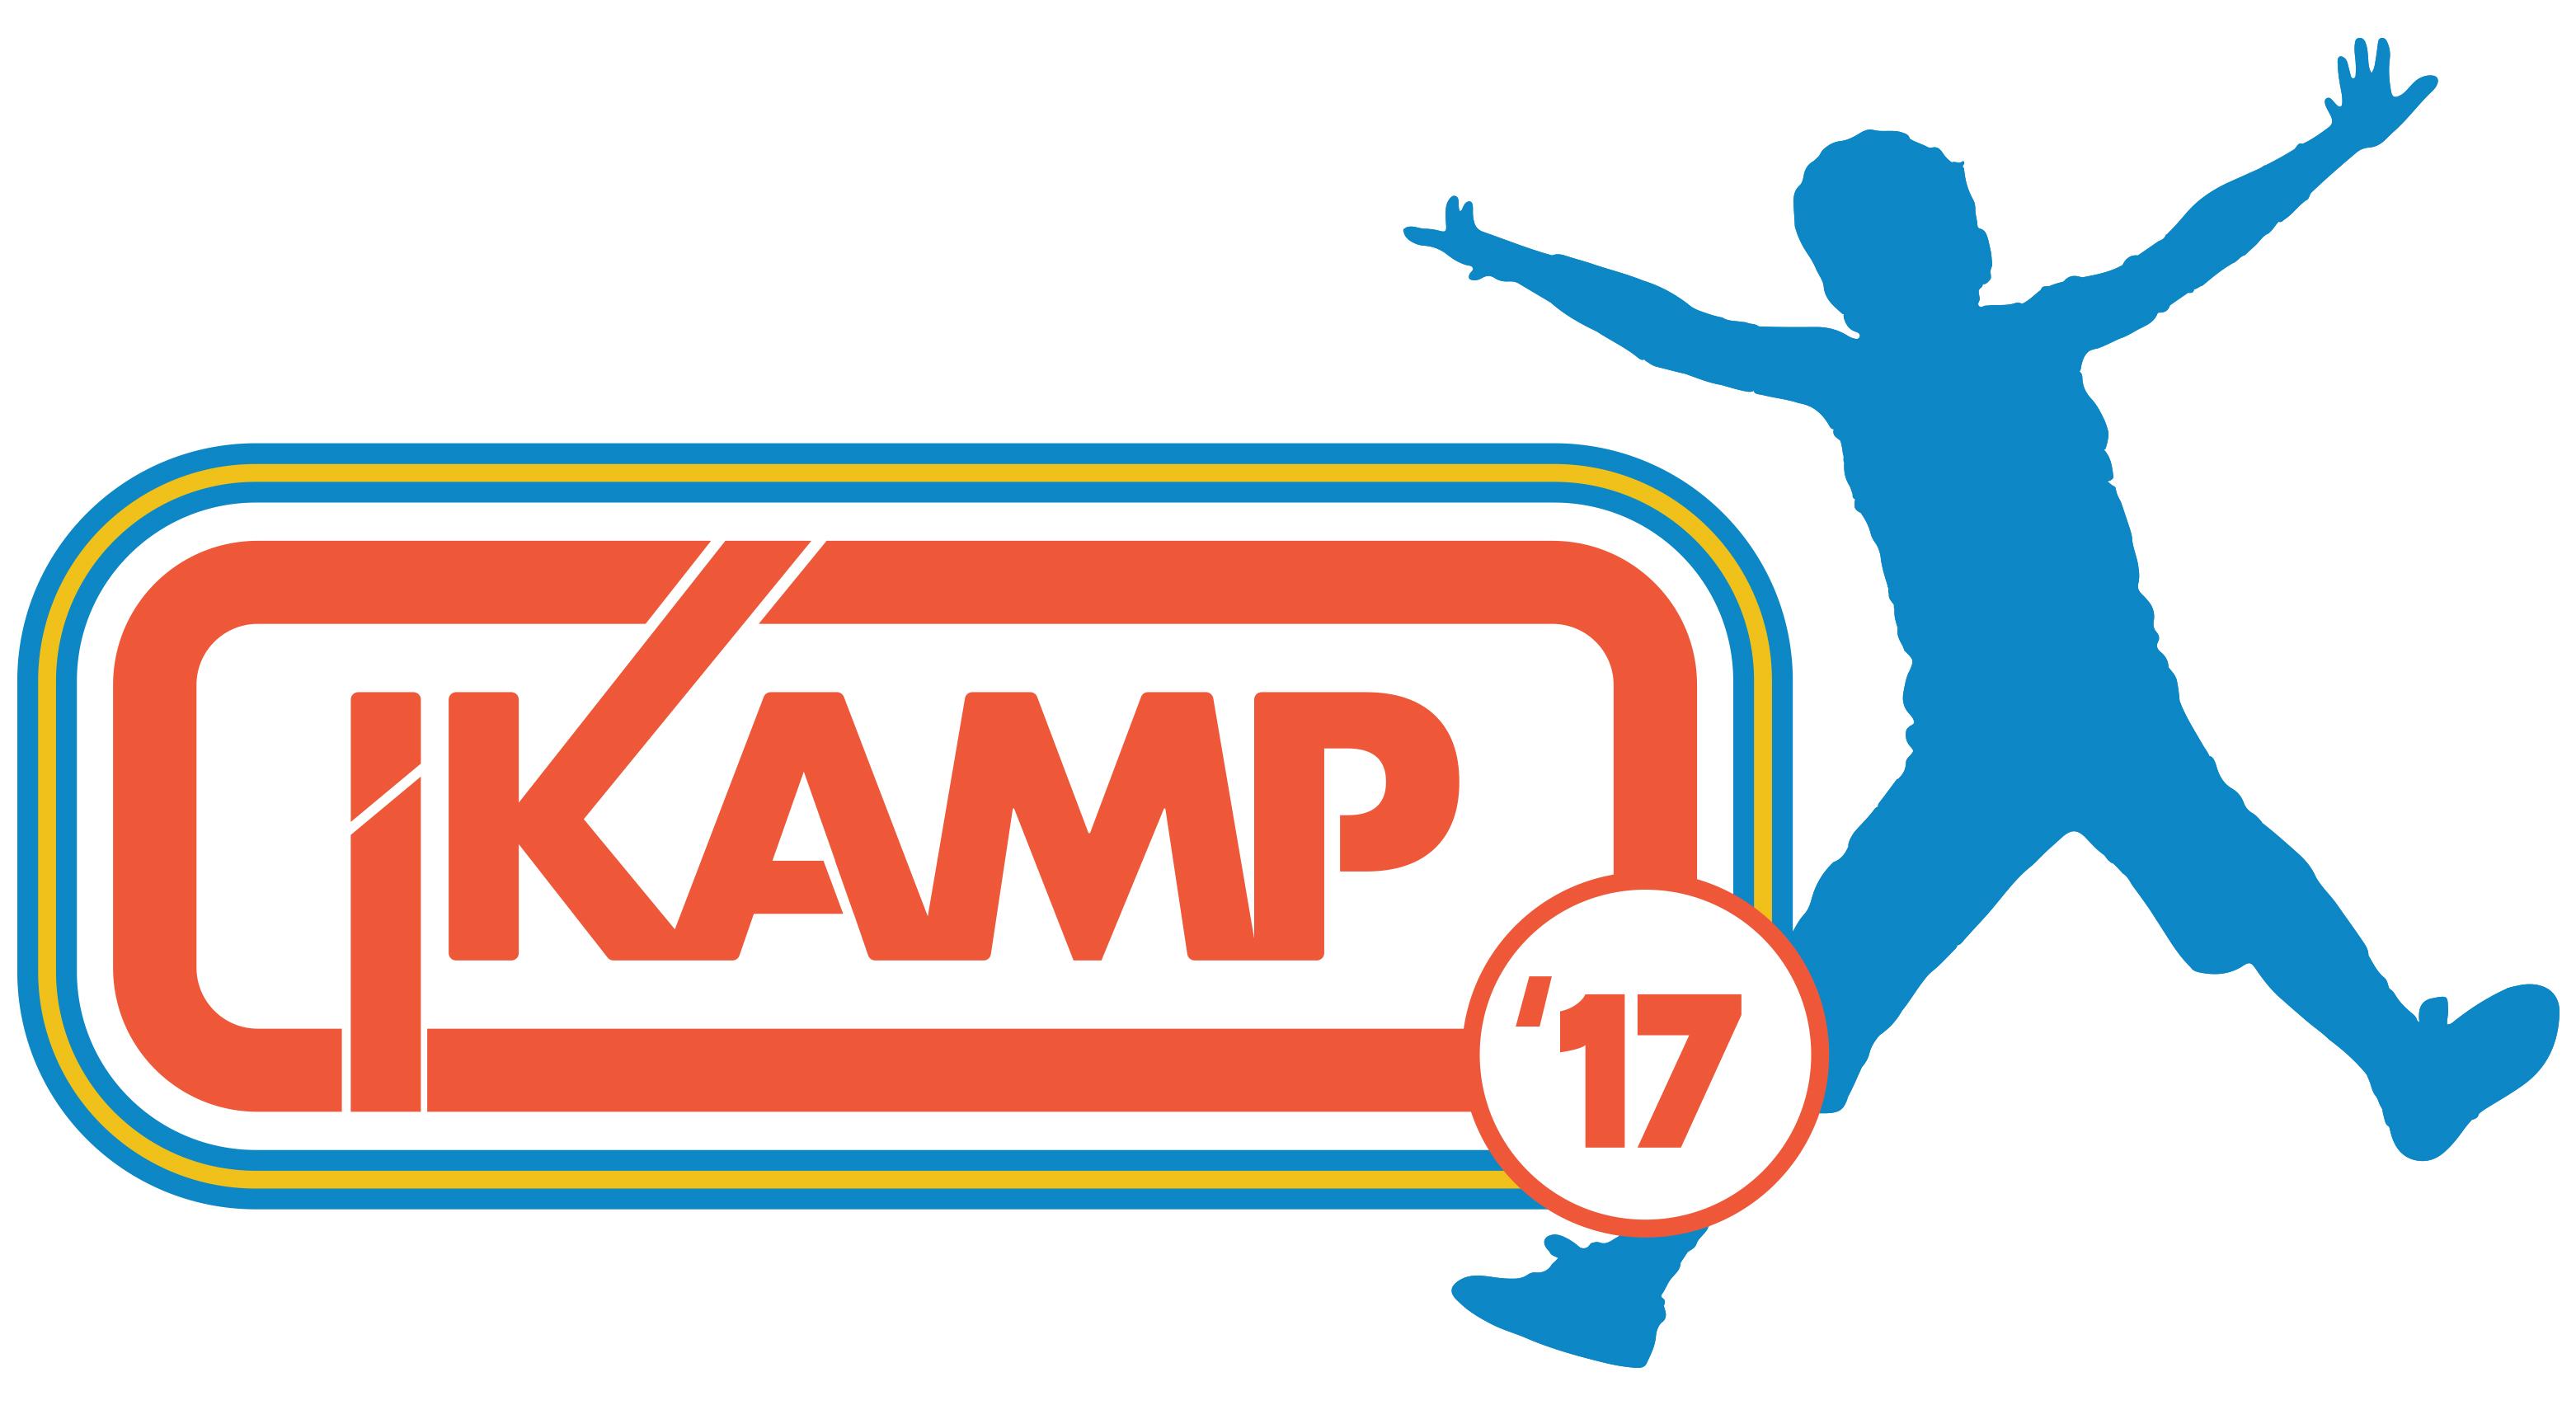 iKamp Logo 2017